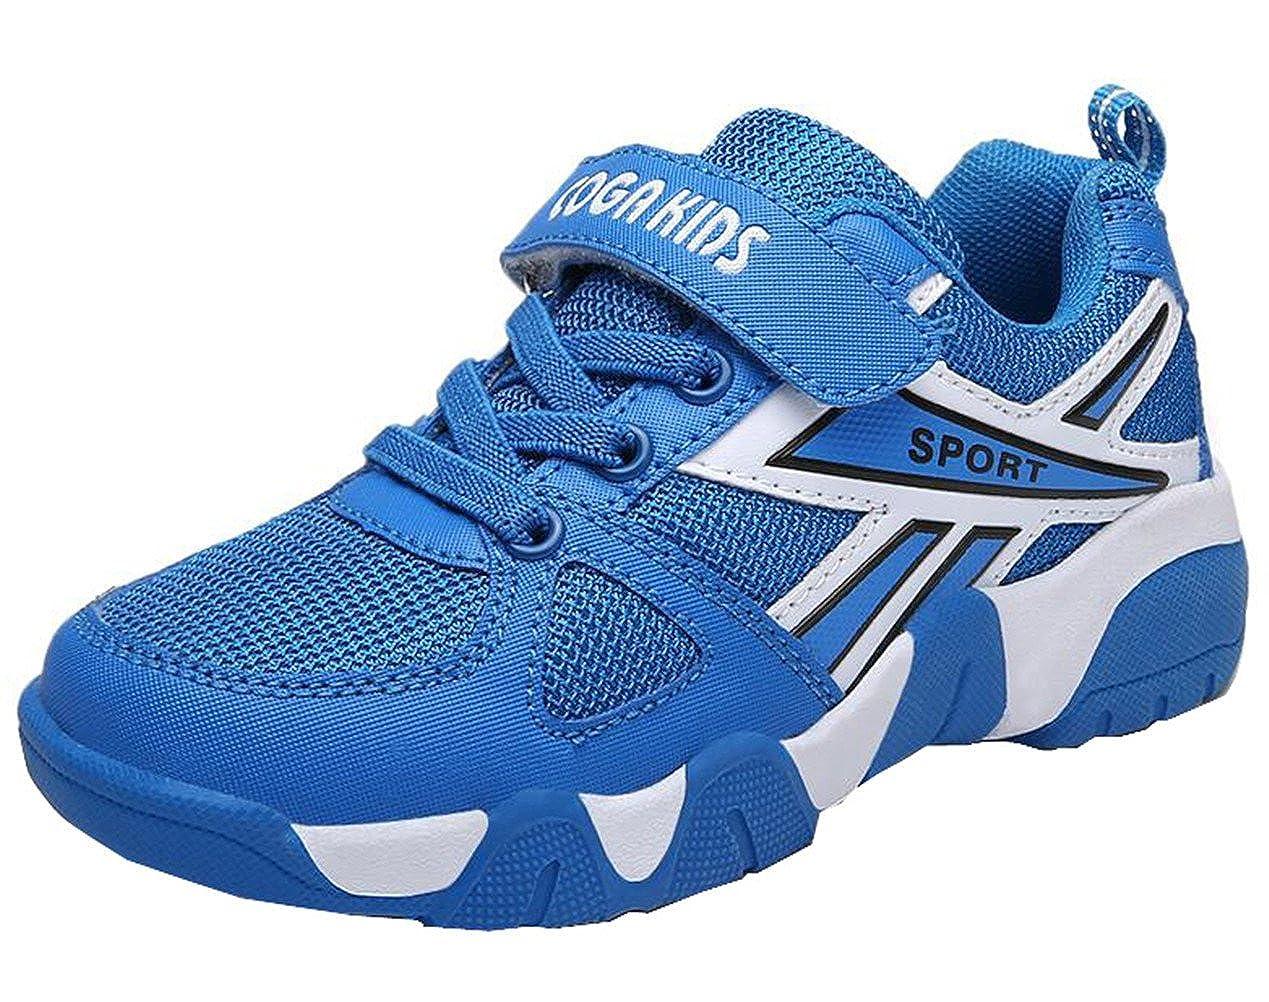 DADAWEN Boy's Girl's Waterproof Casual Outdoor Strap Basketball Sneakers (Toddler/Little Kid/Big Kid) 70677